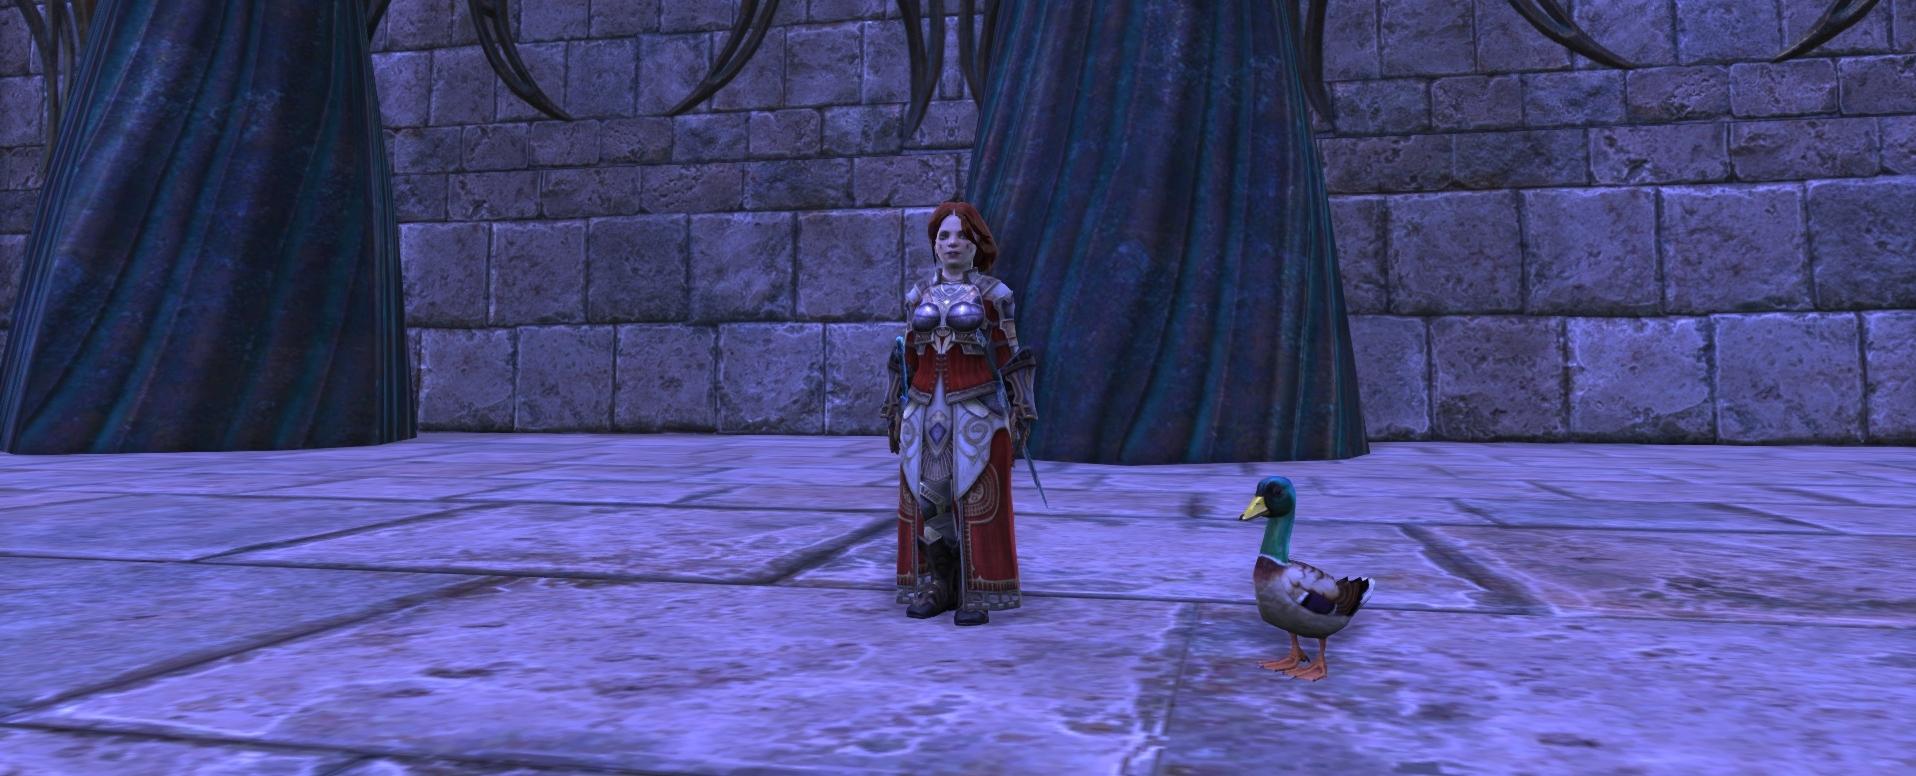 Rift Ducklar Companion